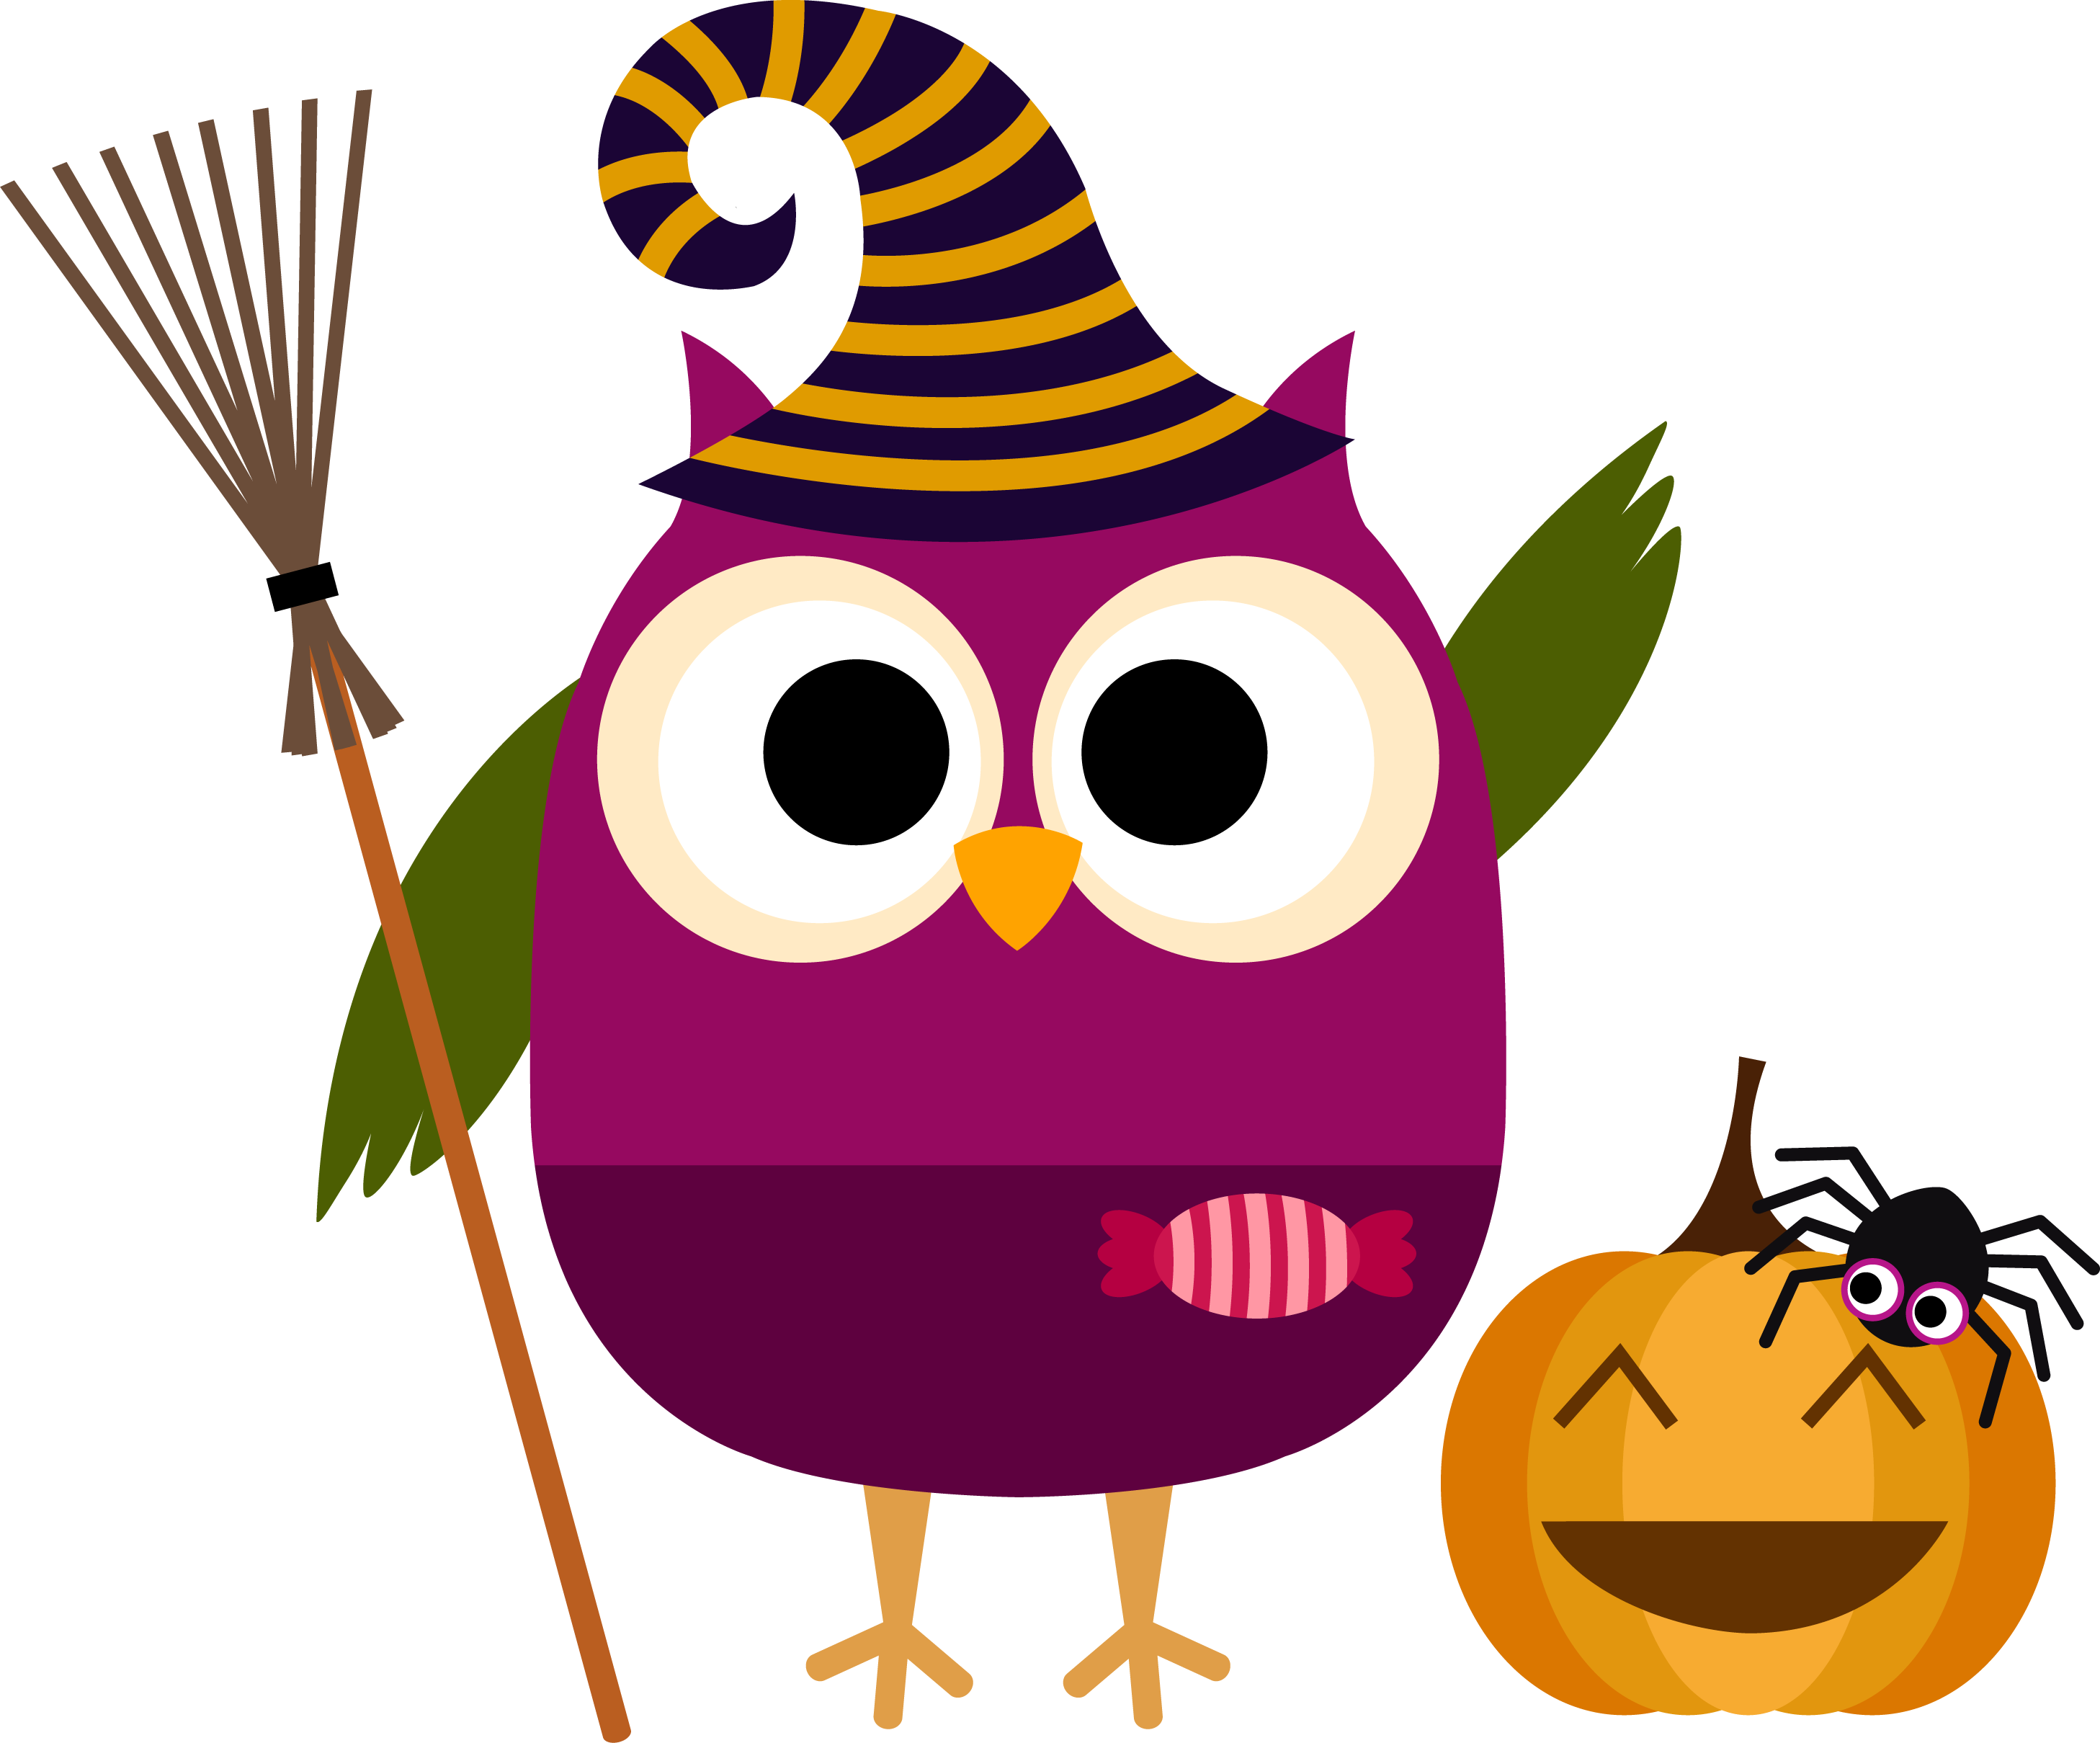 Whimsical halloween clipart image transparent bc3baho-halloween.png (Imagen PNG, 2915 × 2419 píxeles) - Escalado ... image transparent